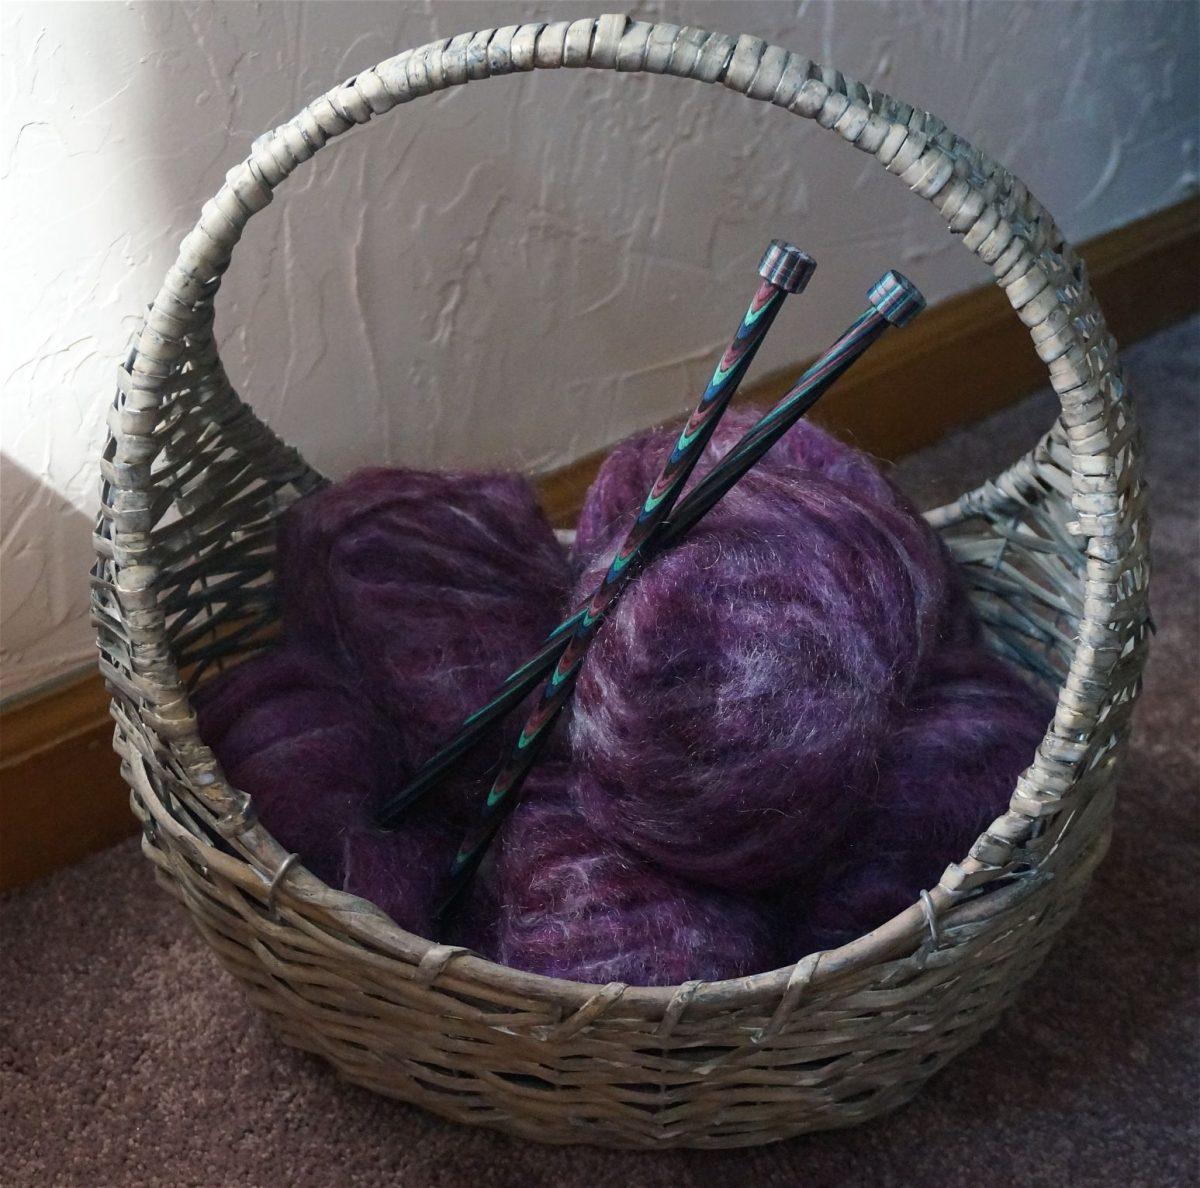 11mohair-yarn-in-a-basket-1425998-1200x1200.jpg